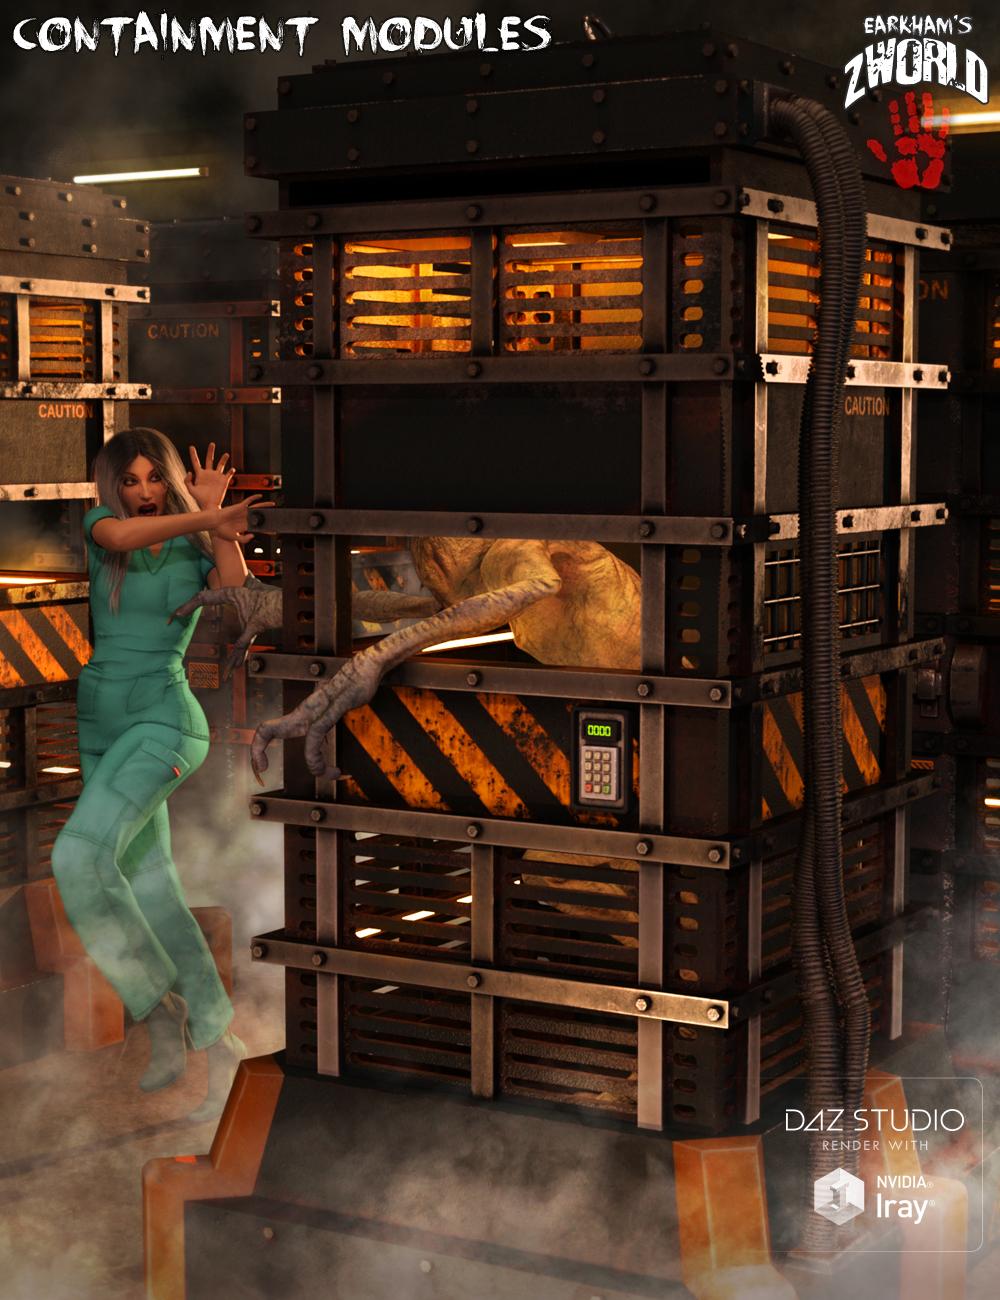 ZWorld Containment Modules by: E-Arkham, 3D Models by Daz 3D